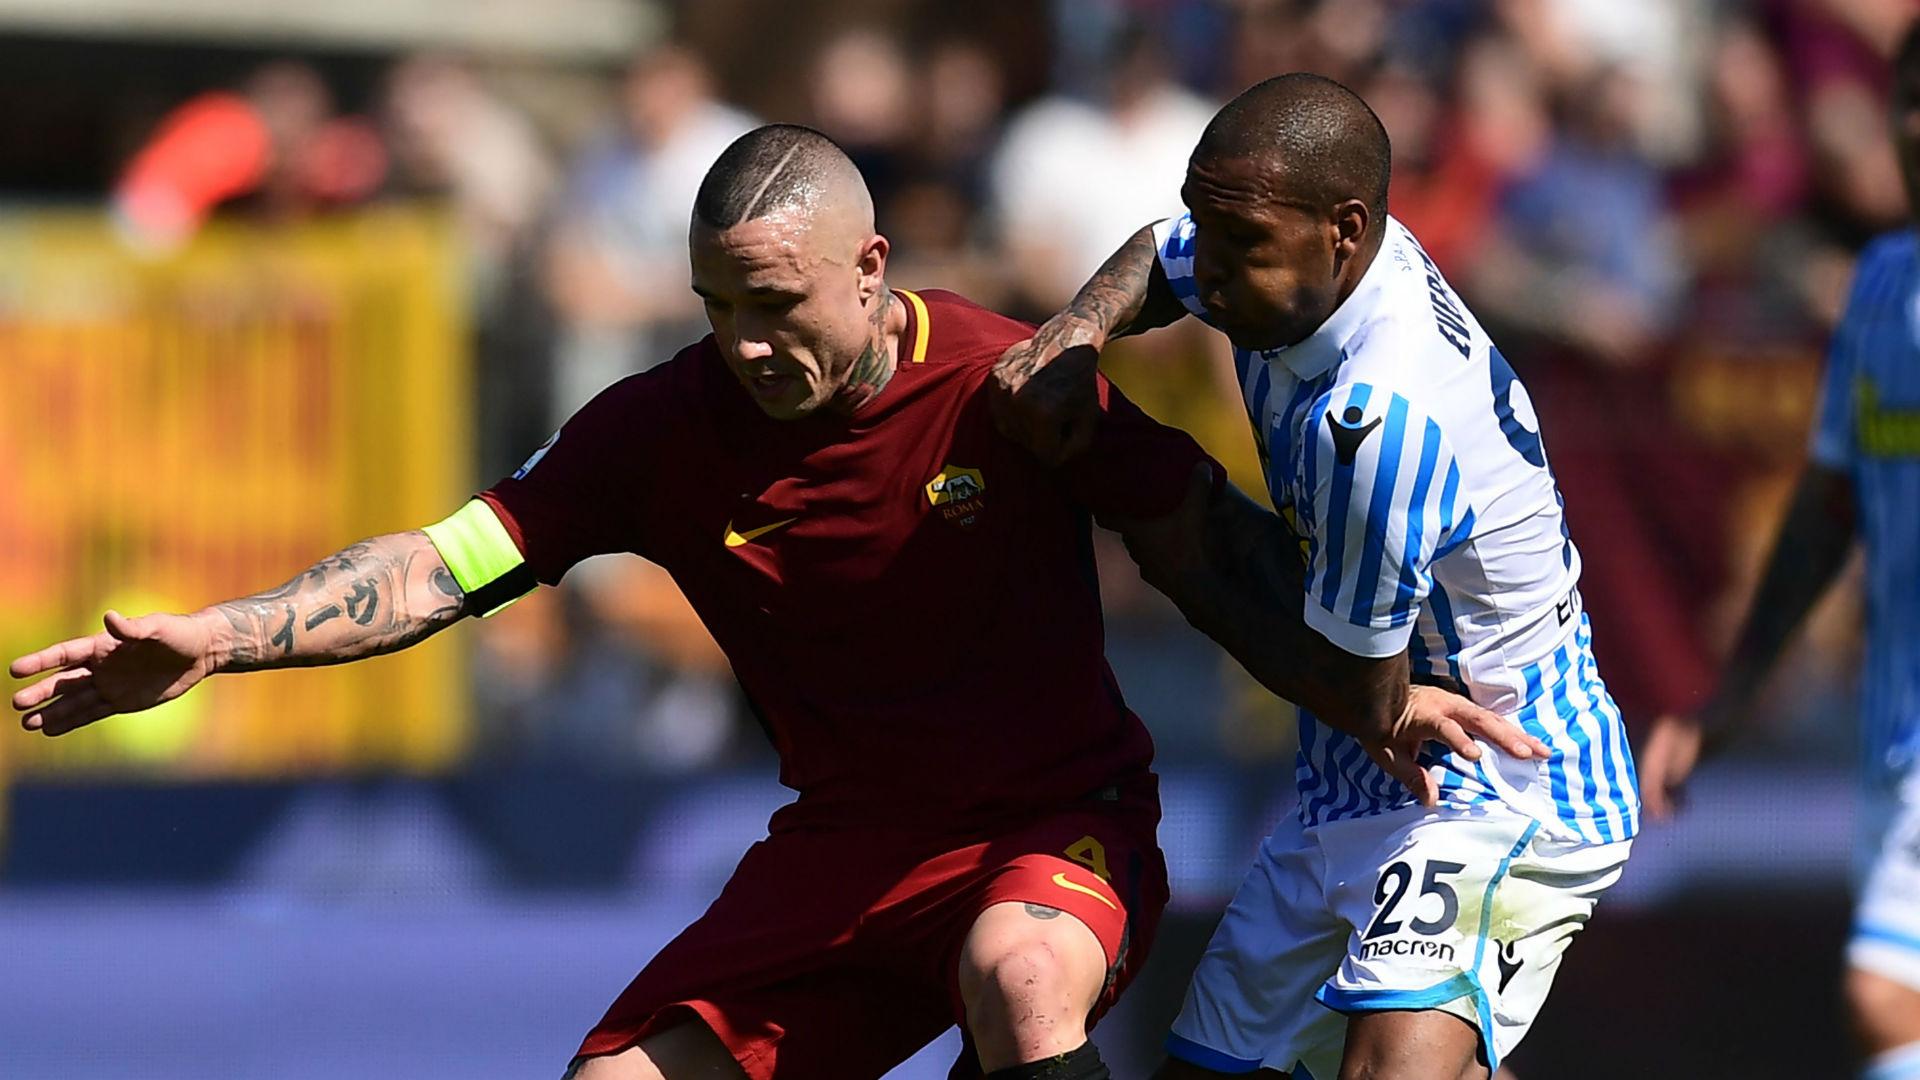 Radja Nainggolan Everton Luis Roma SPAL Serie A 2018